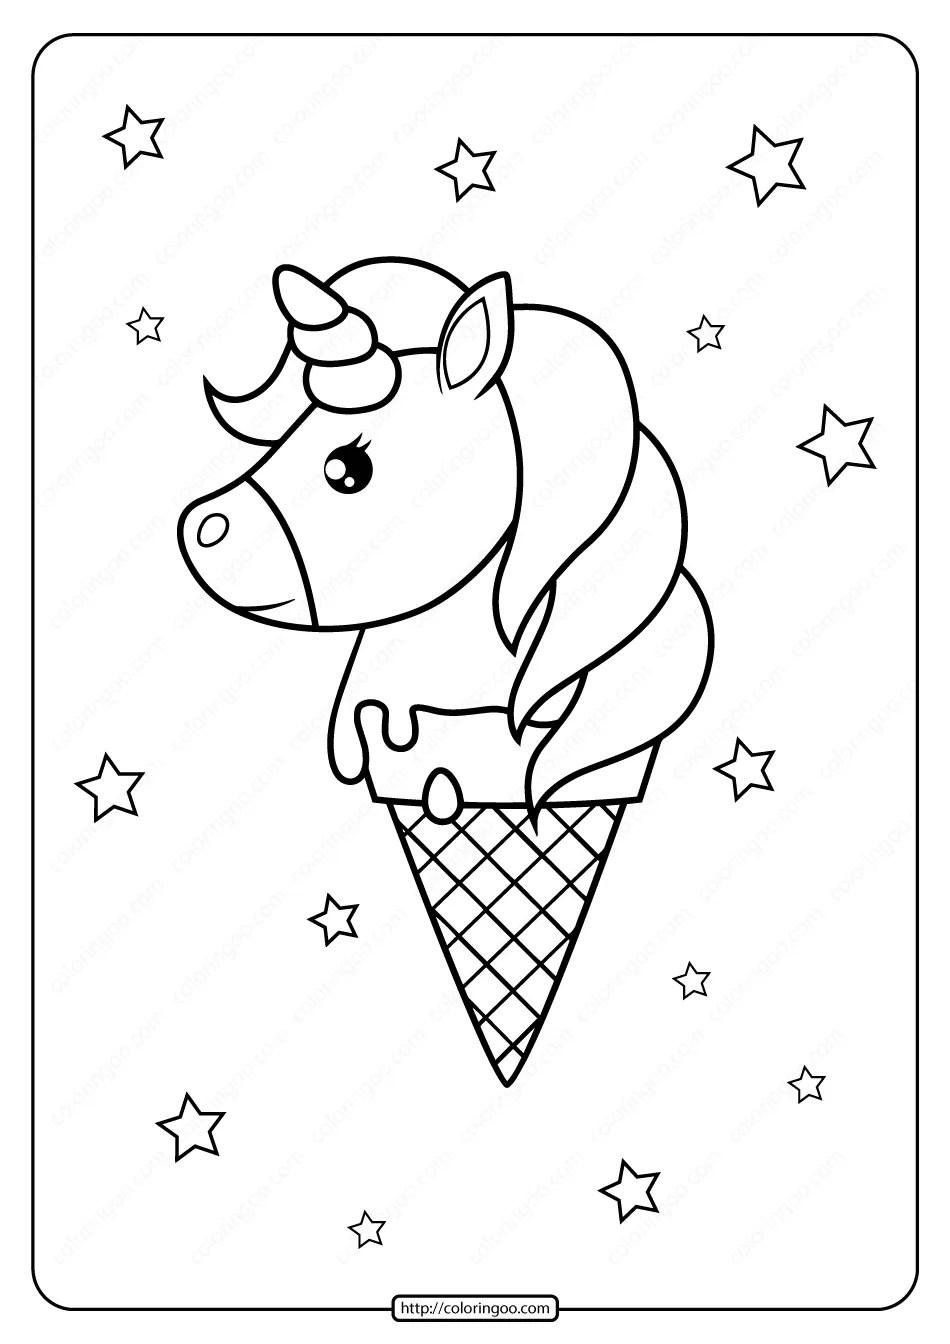 Printable Unicorn Ice Cream Cone Coloring Page